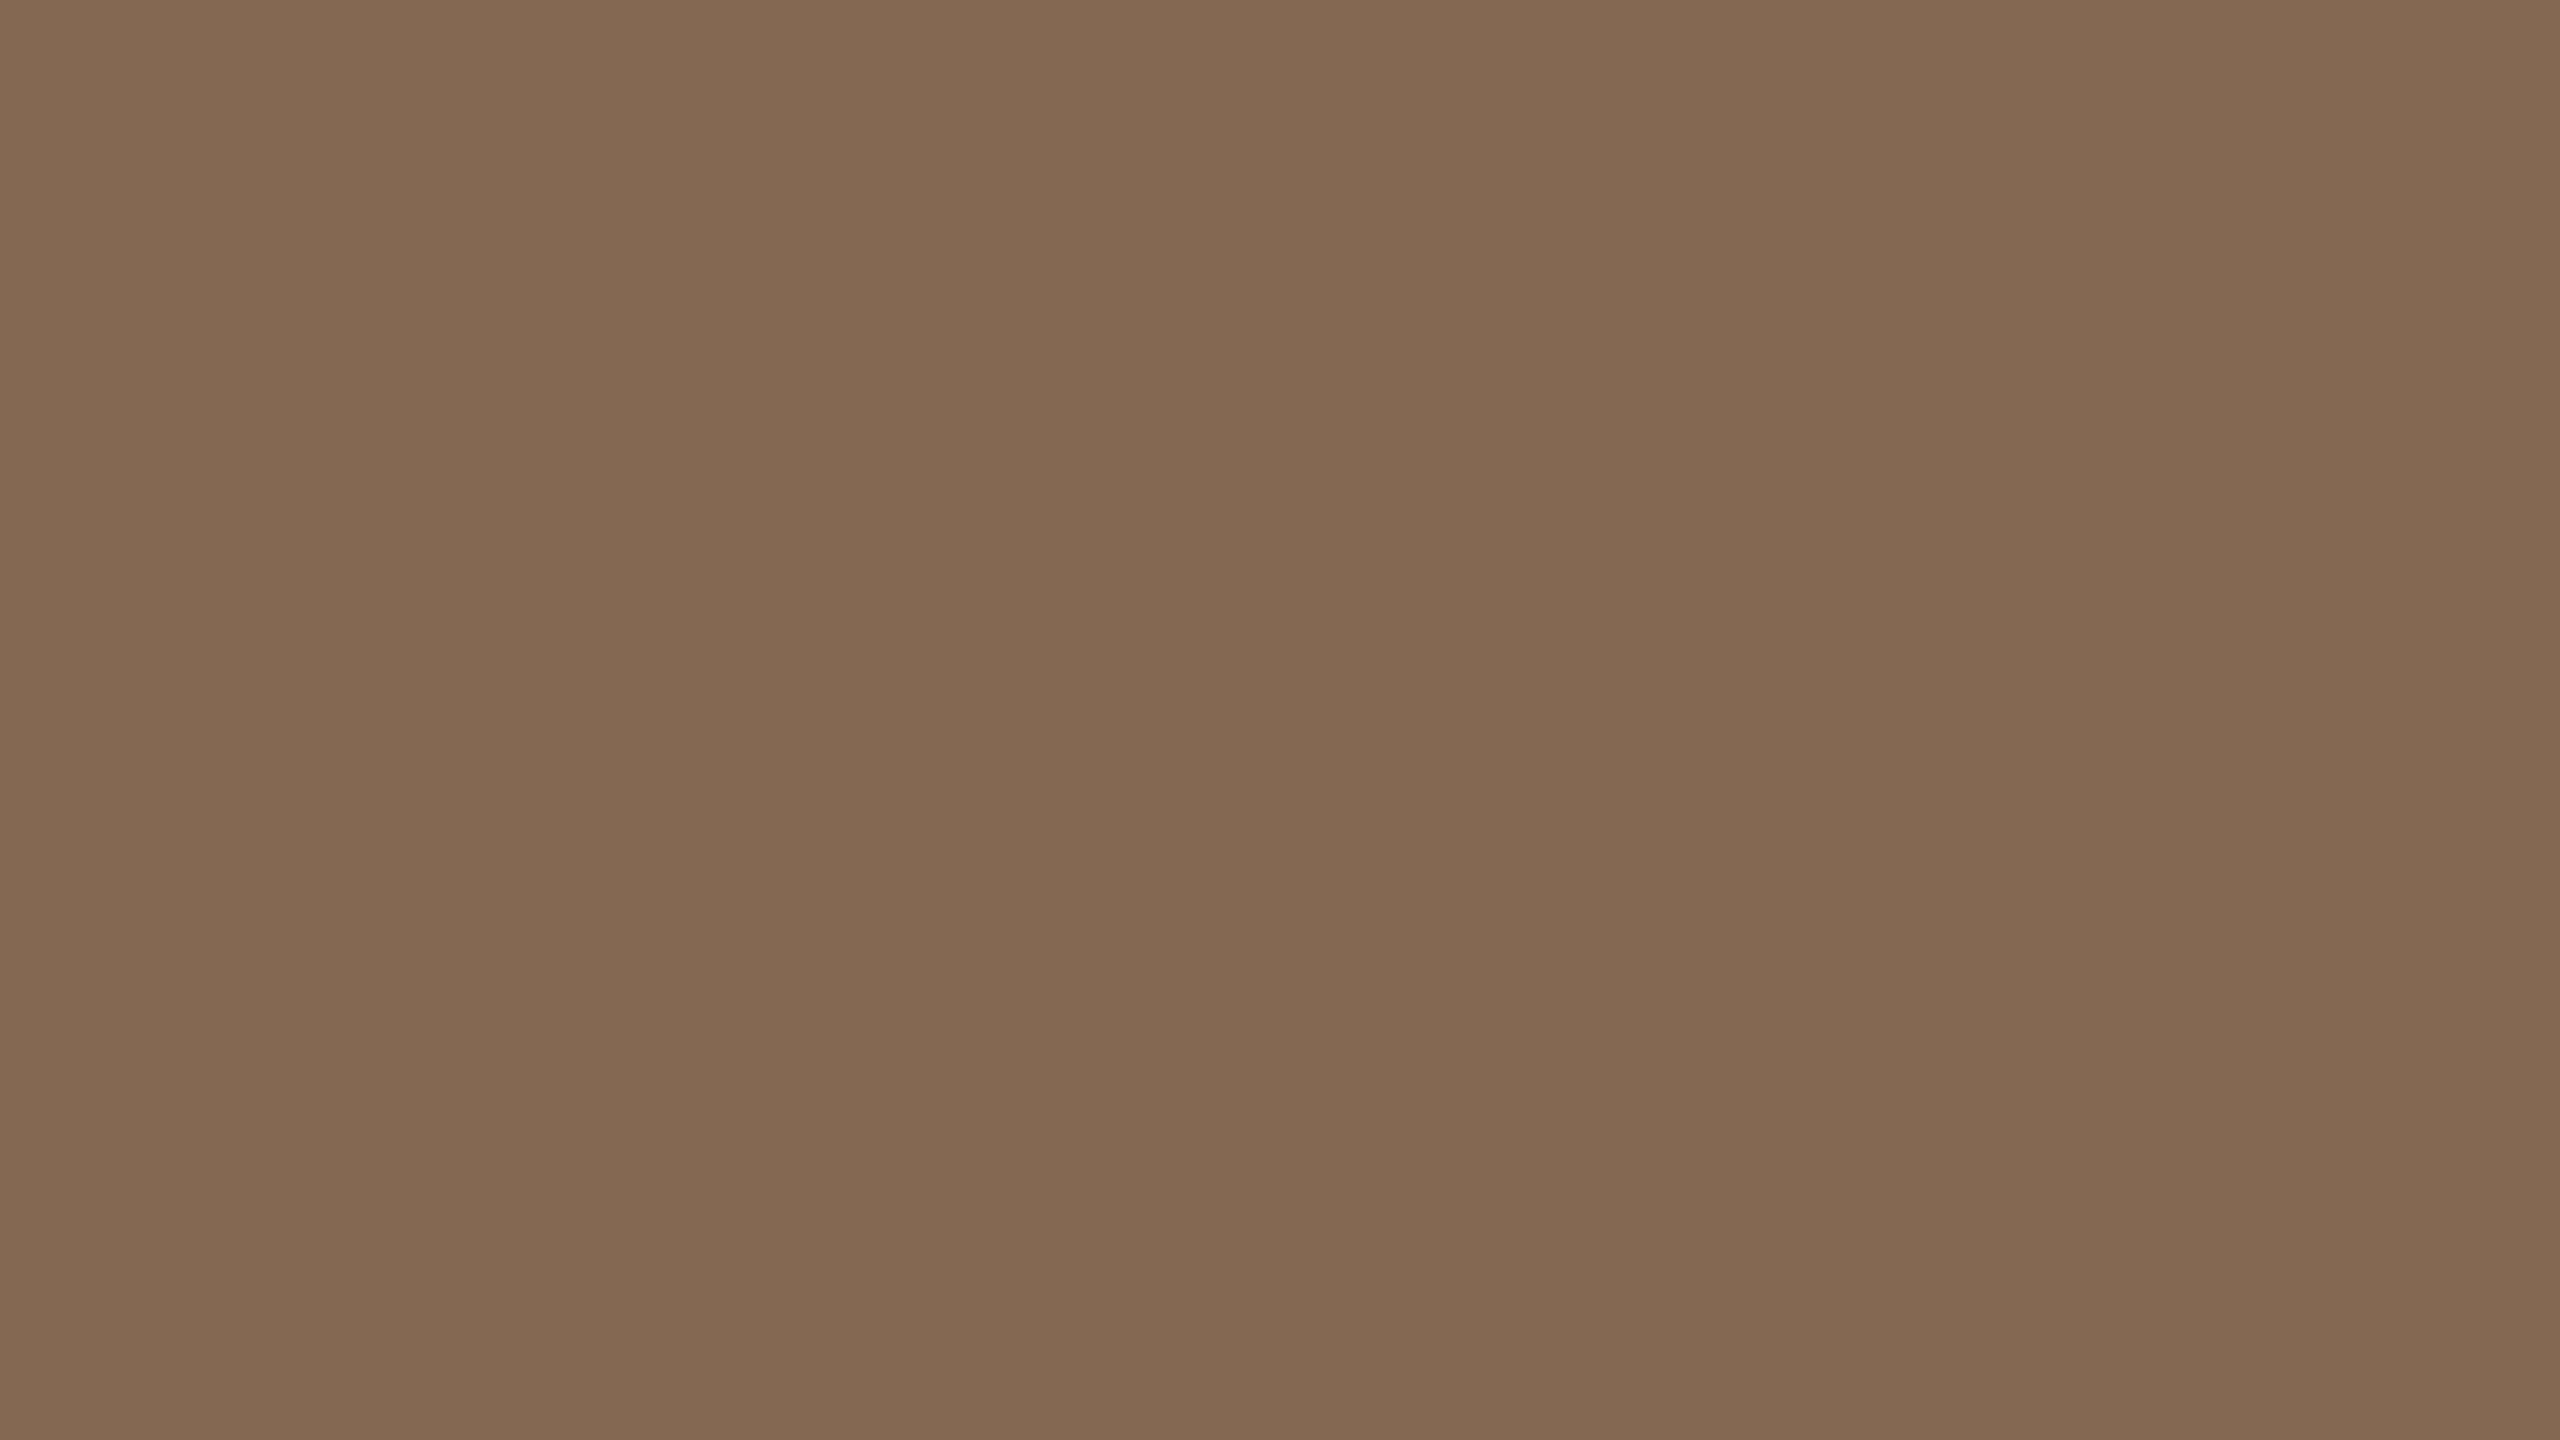 Solid Pastel Colors Background Www Pixshark Com Images